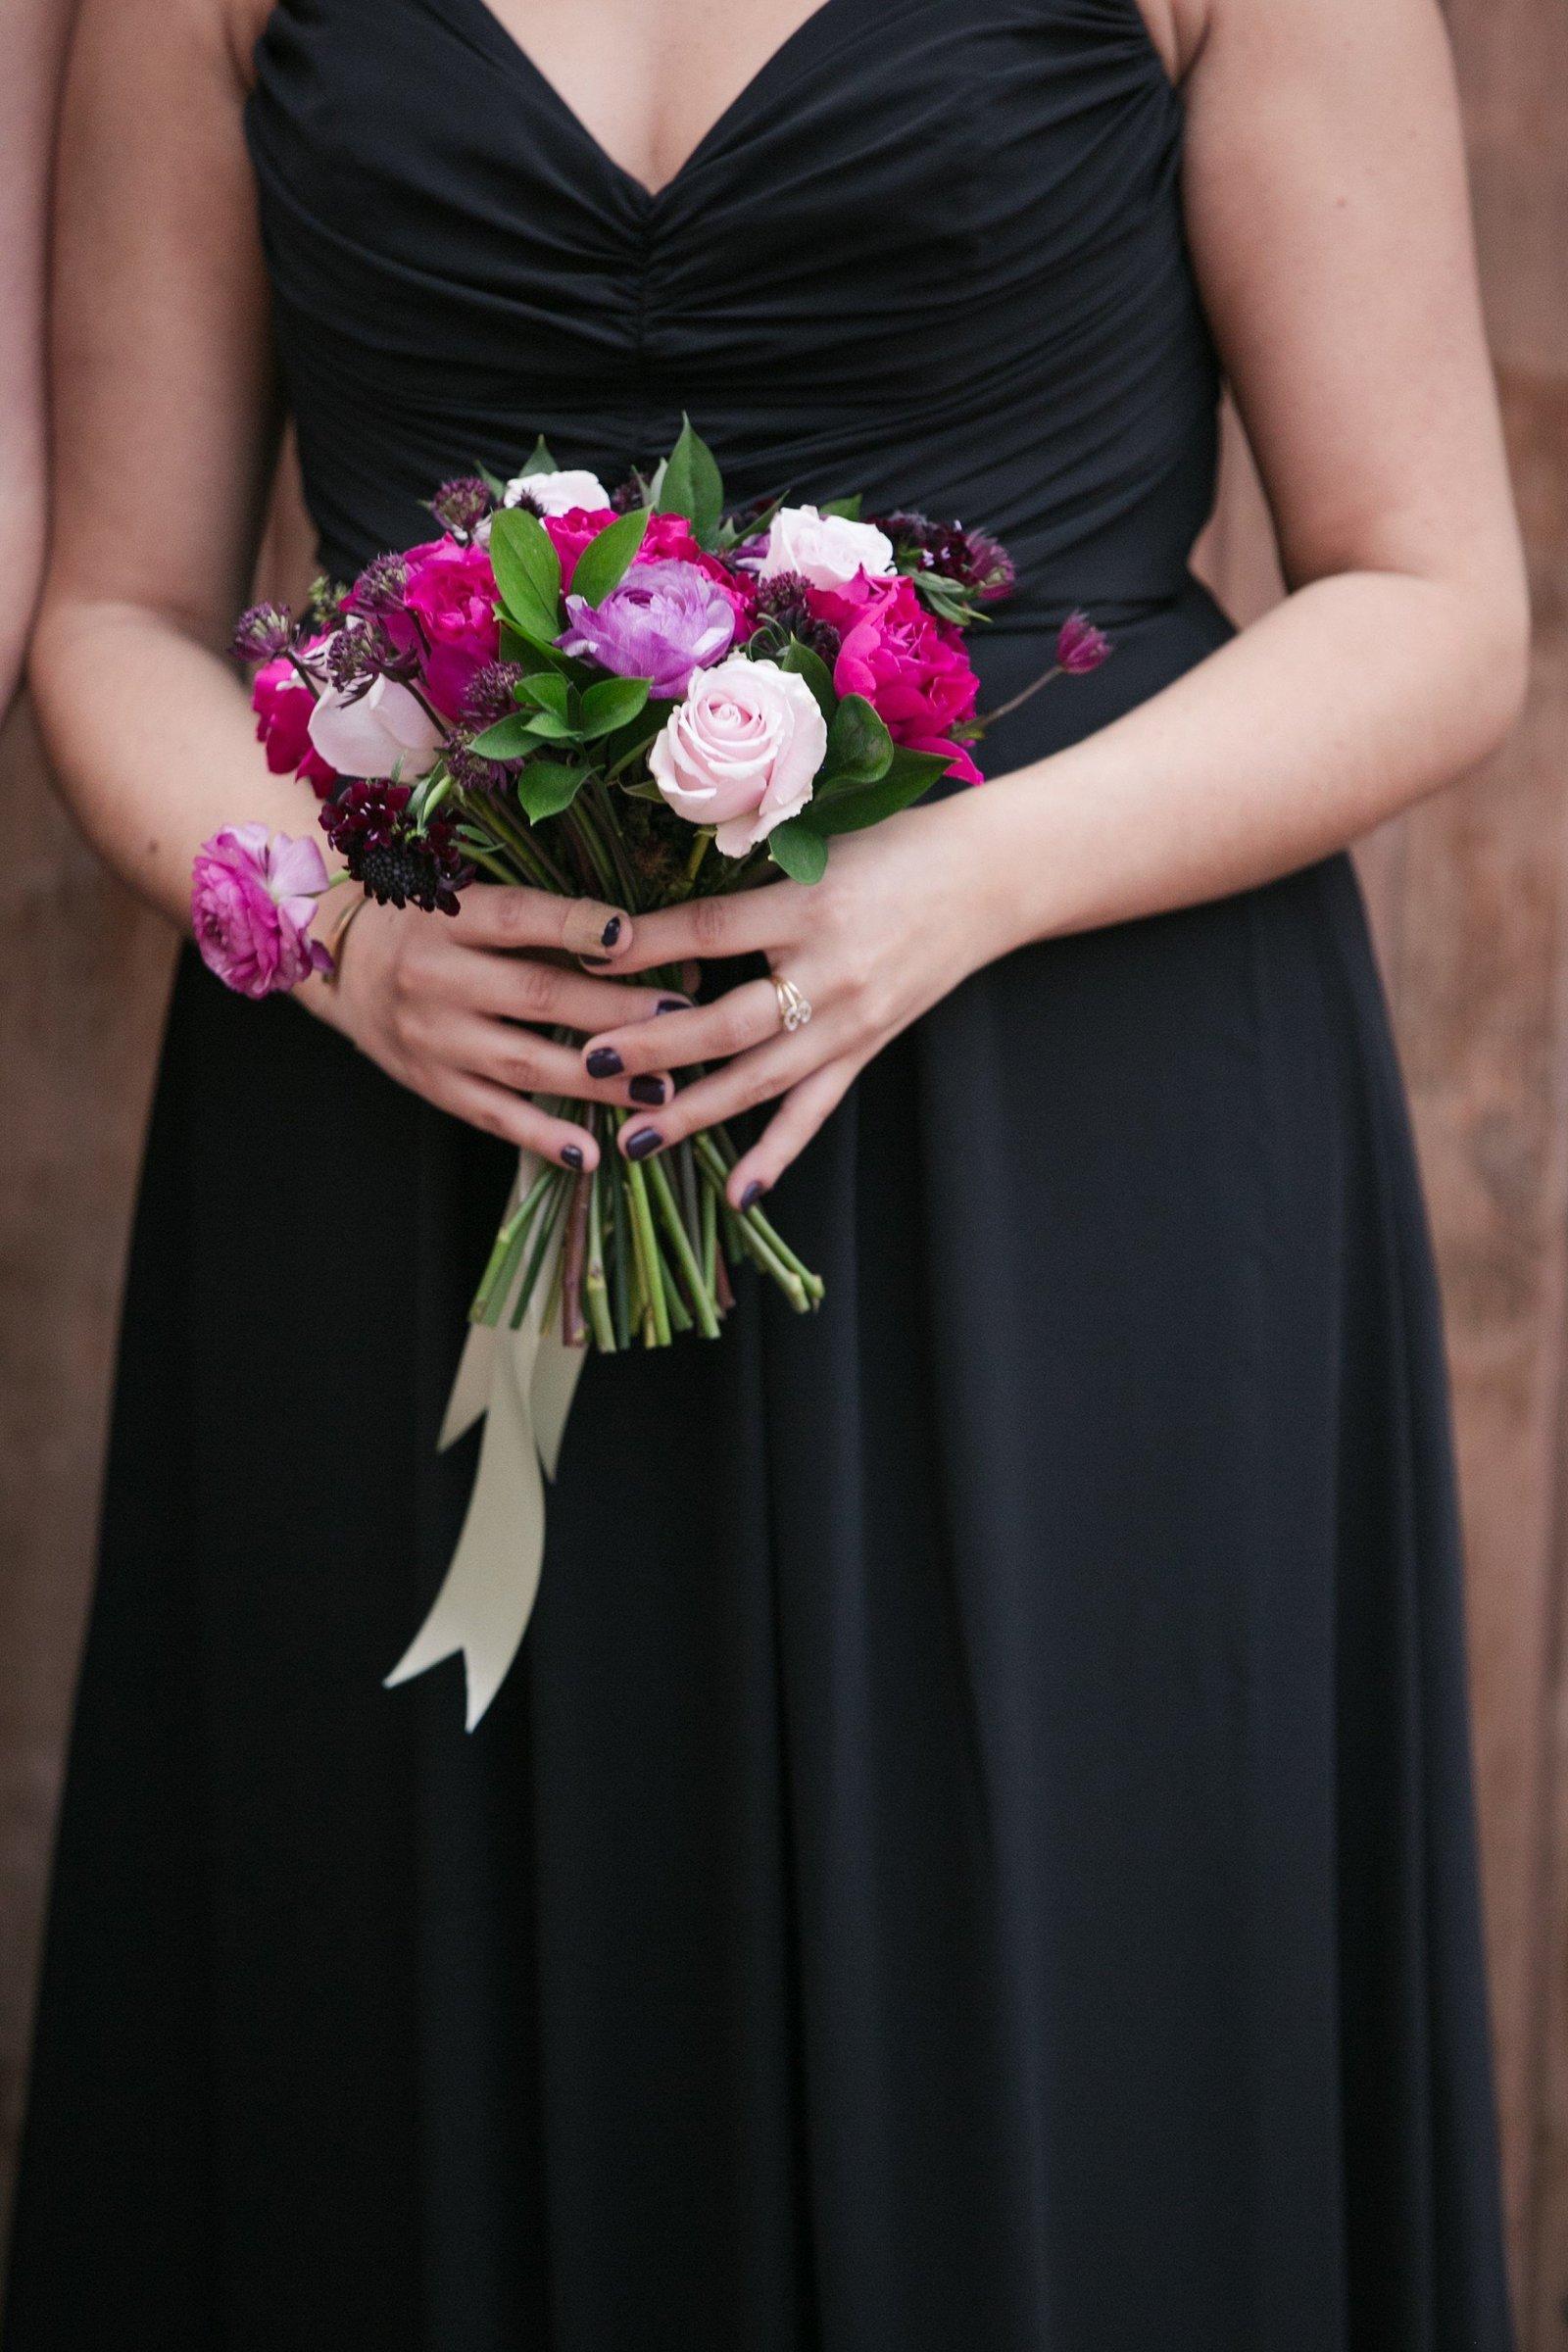 Black-tie-wedding-photos-longview-gallery-dc (162)